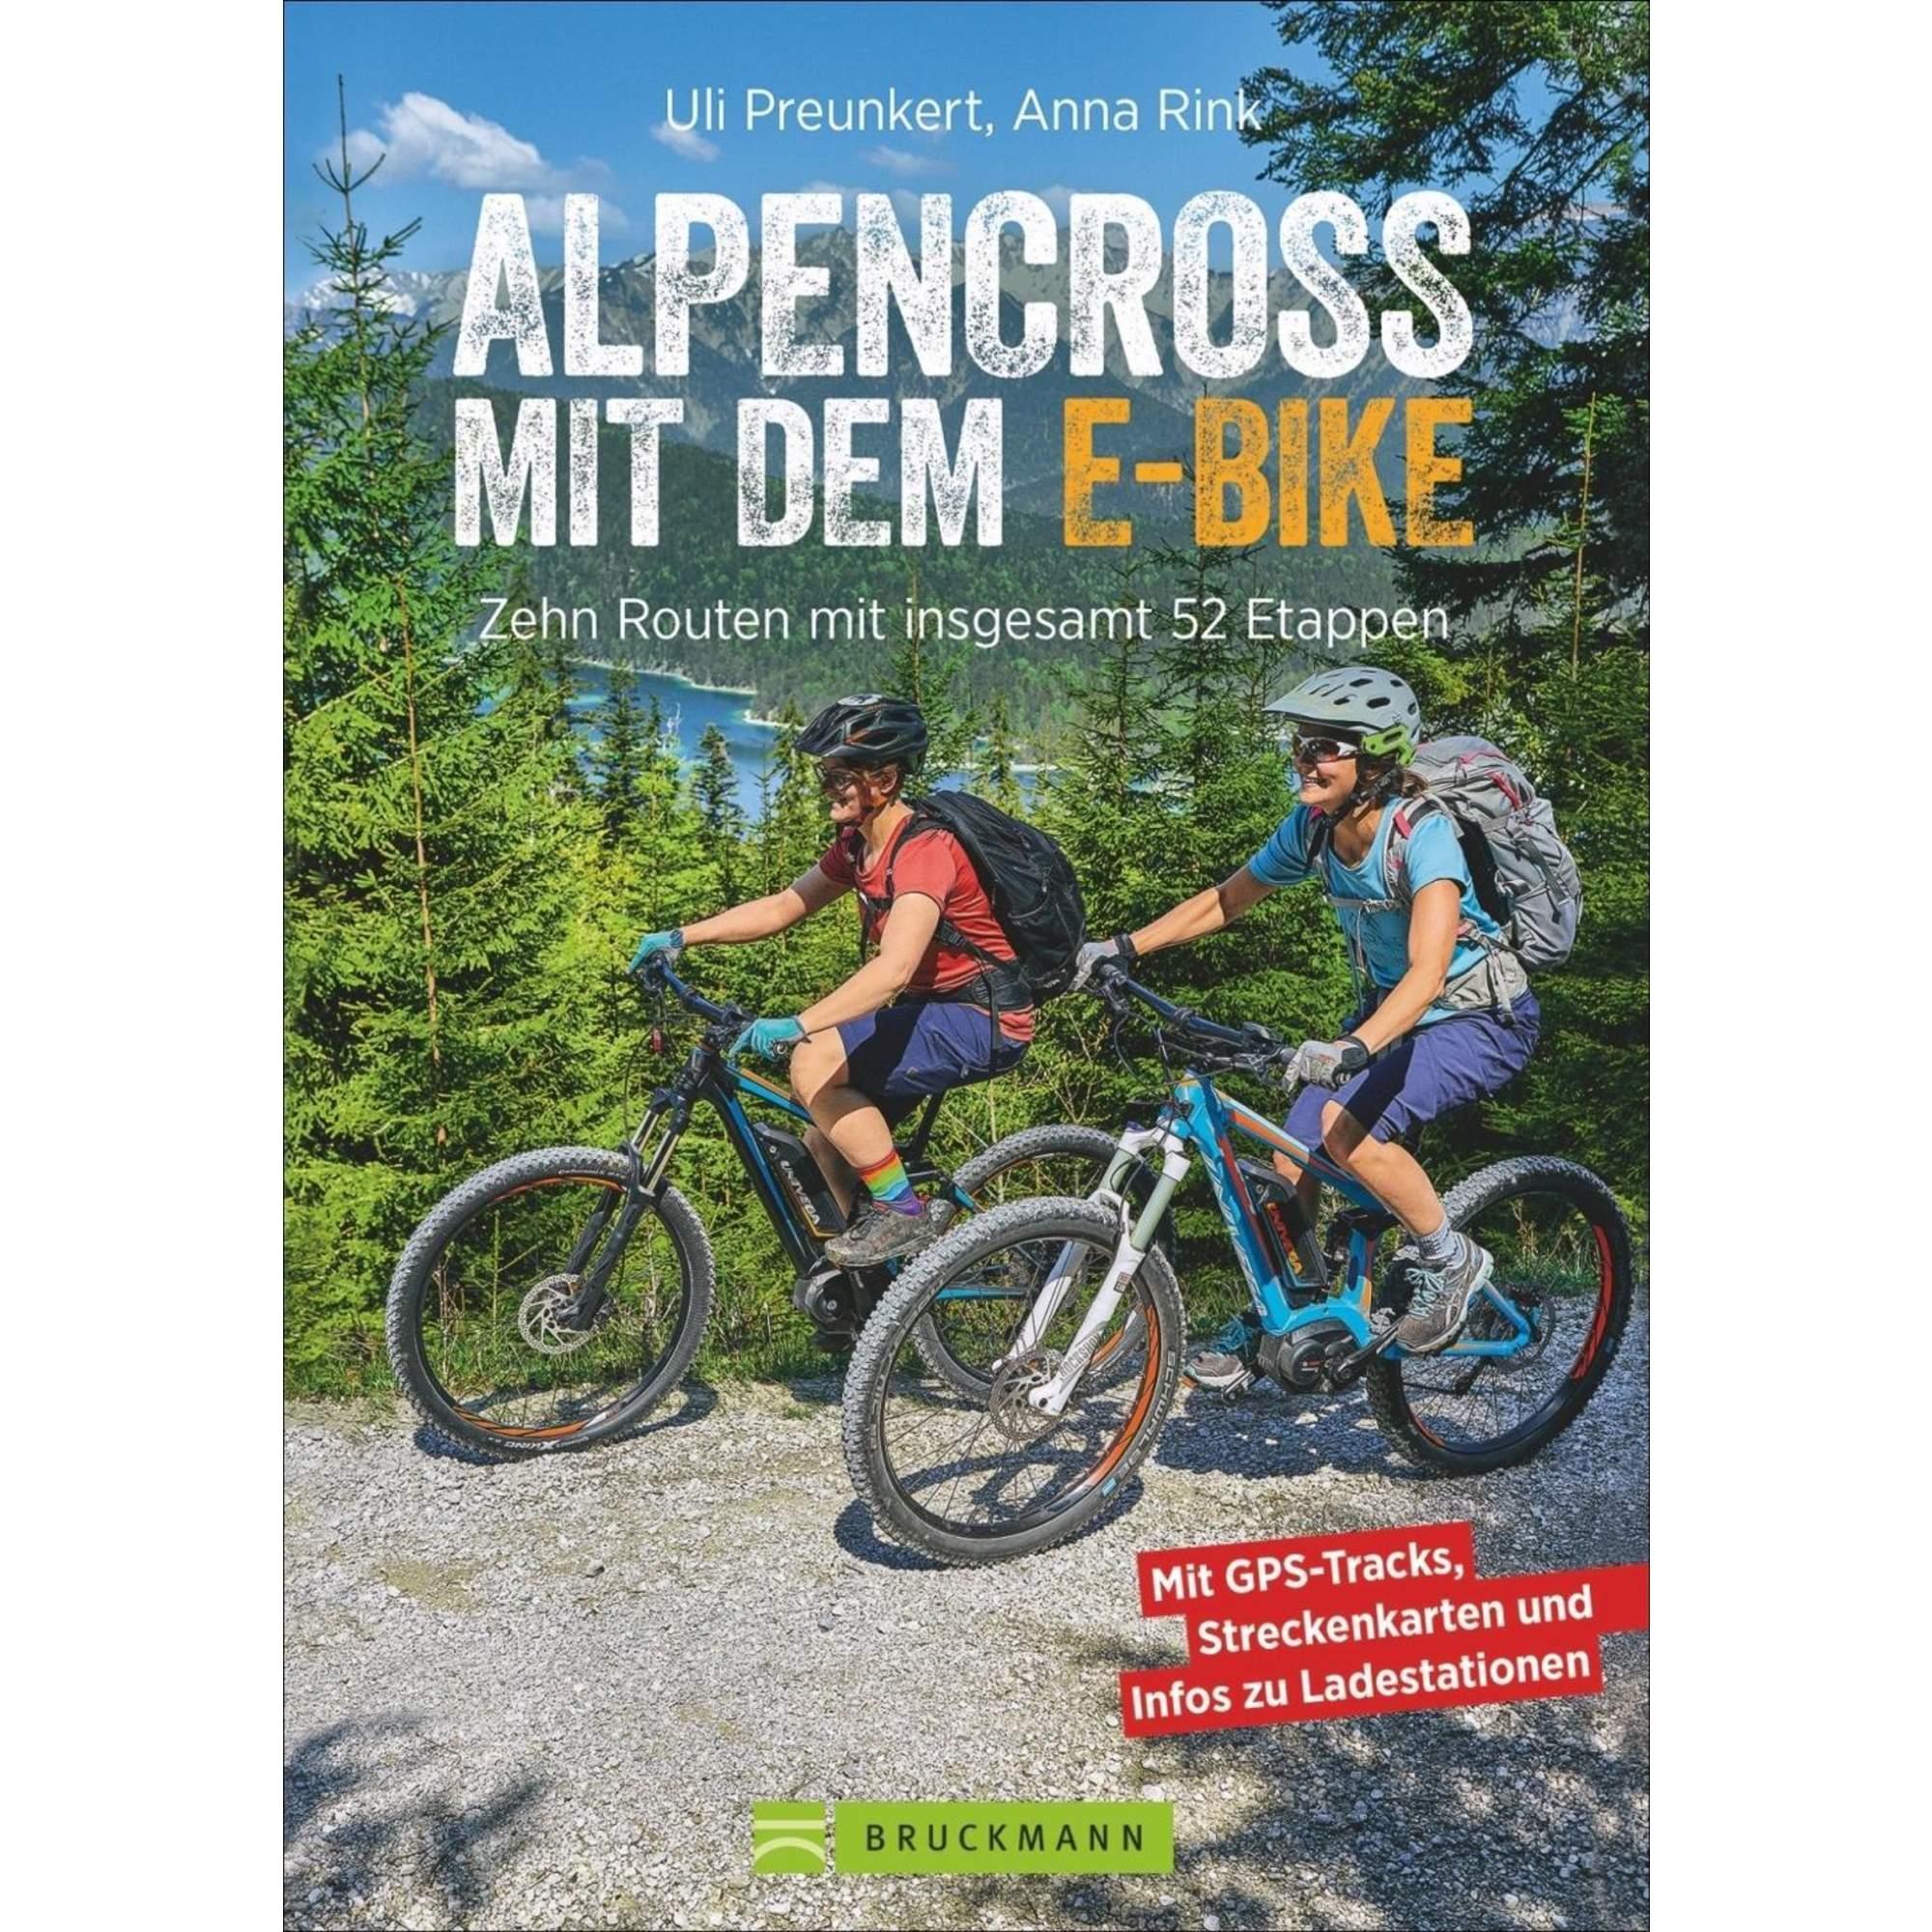 Alpencross mit dem E-Bike, 24,99 Euro